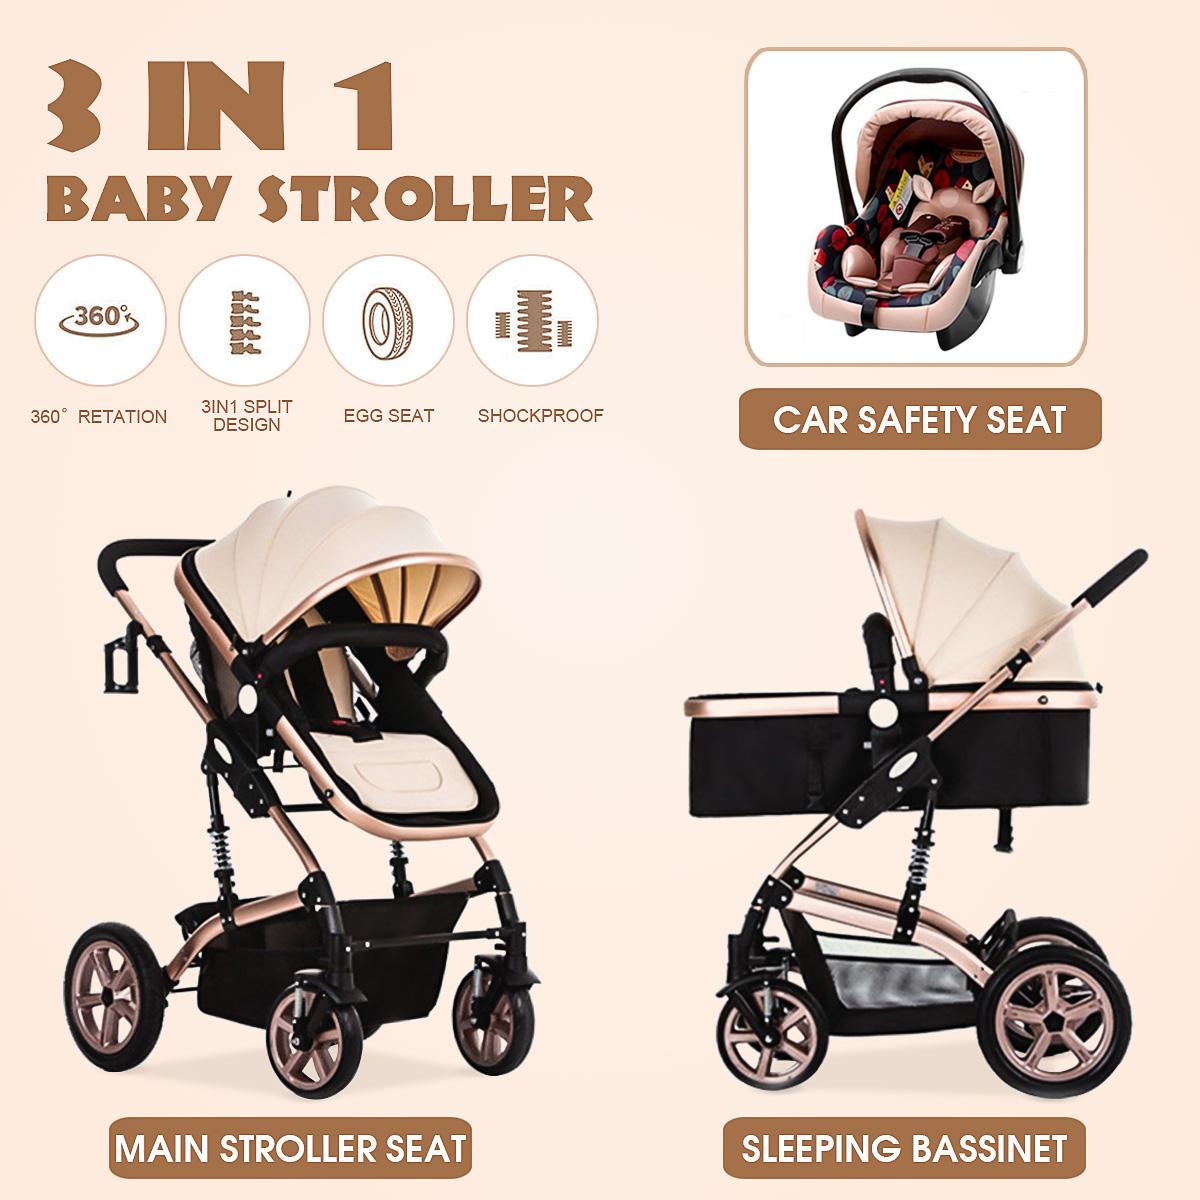 Baby Stroller 3 in 1 Pram Foldable Pushchair Luxury Travel System Anti-explosion